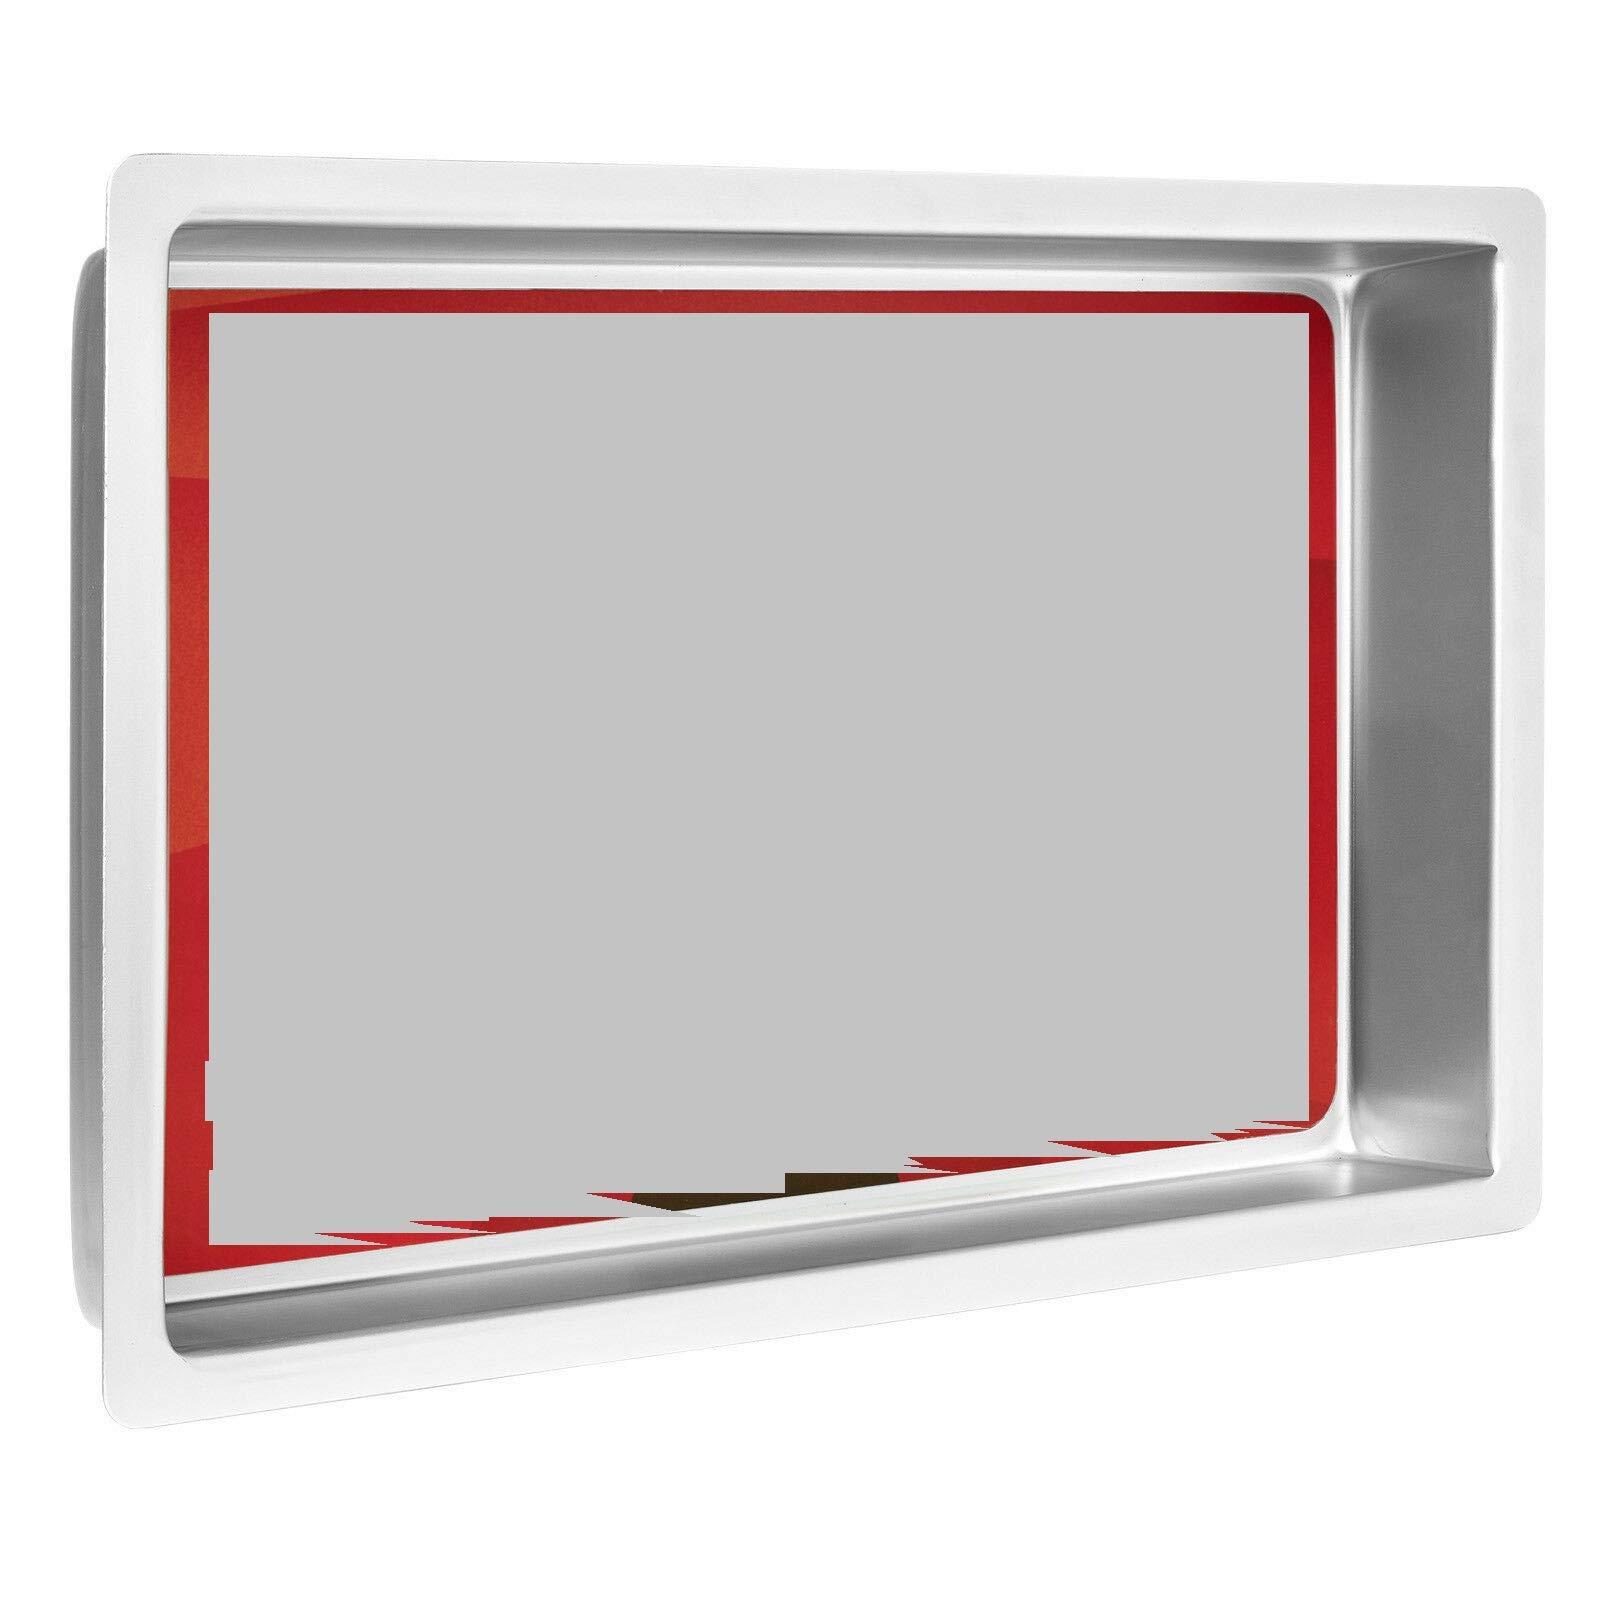 1 Pcs Professional Rectangular Aluminum Sheet Cake Pan 9 x 13 x 2 Inch #MWMN